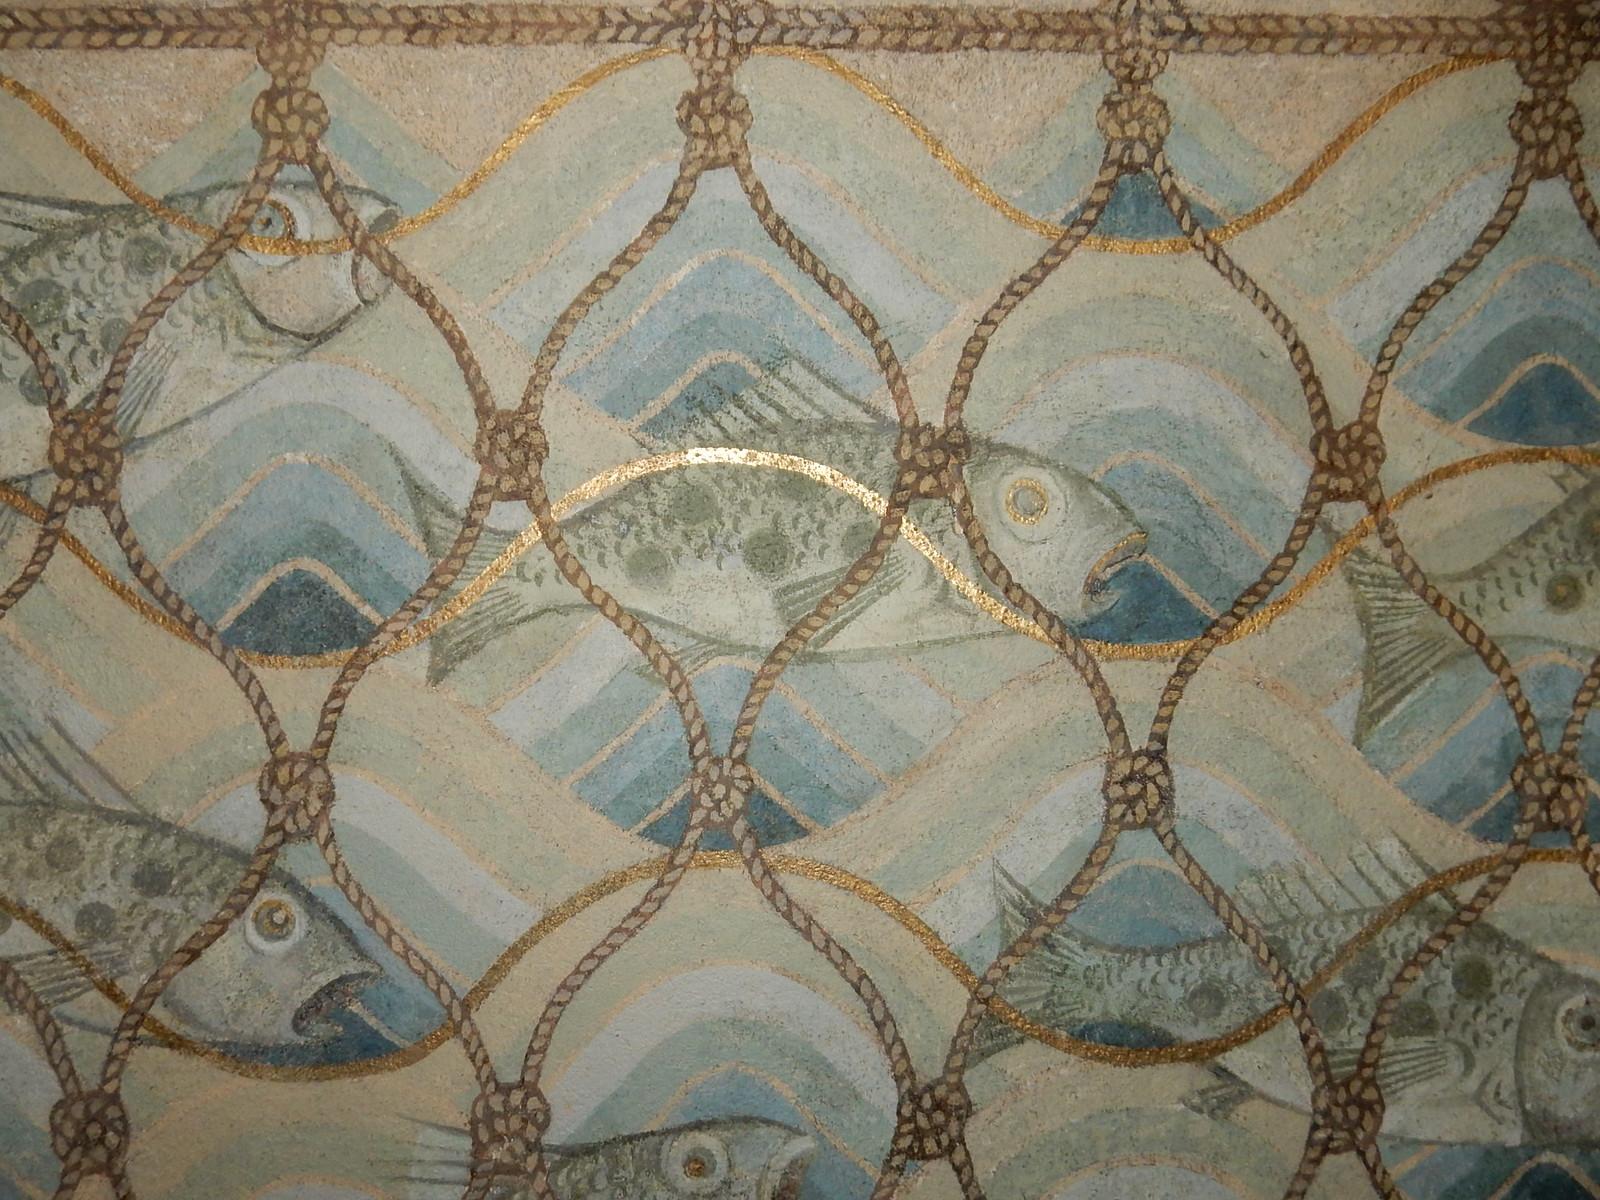 Fish, Hascombe church Milford to Godalming